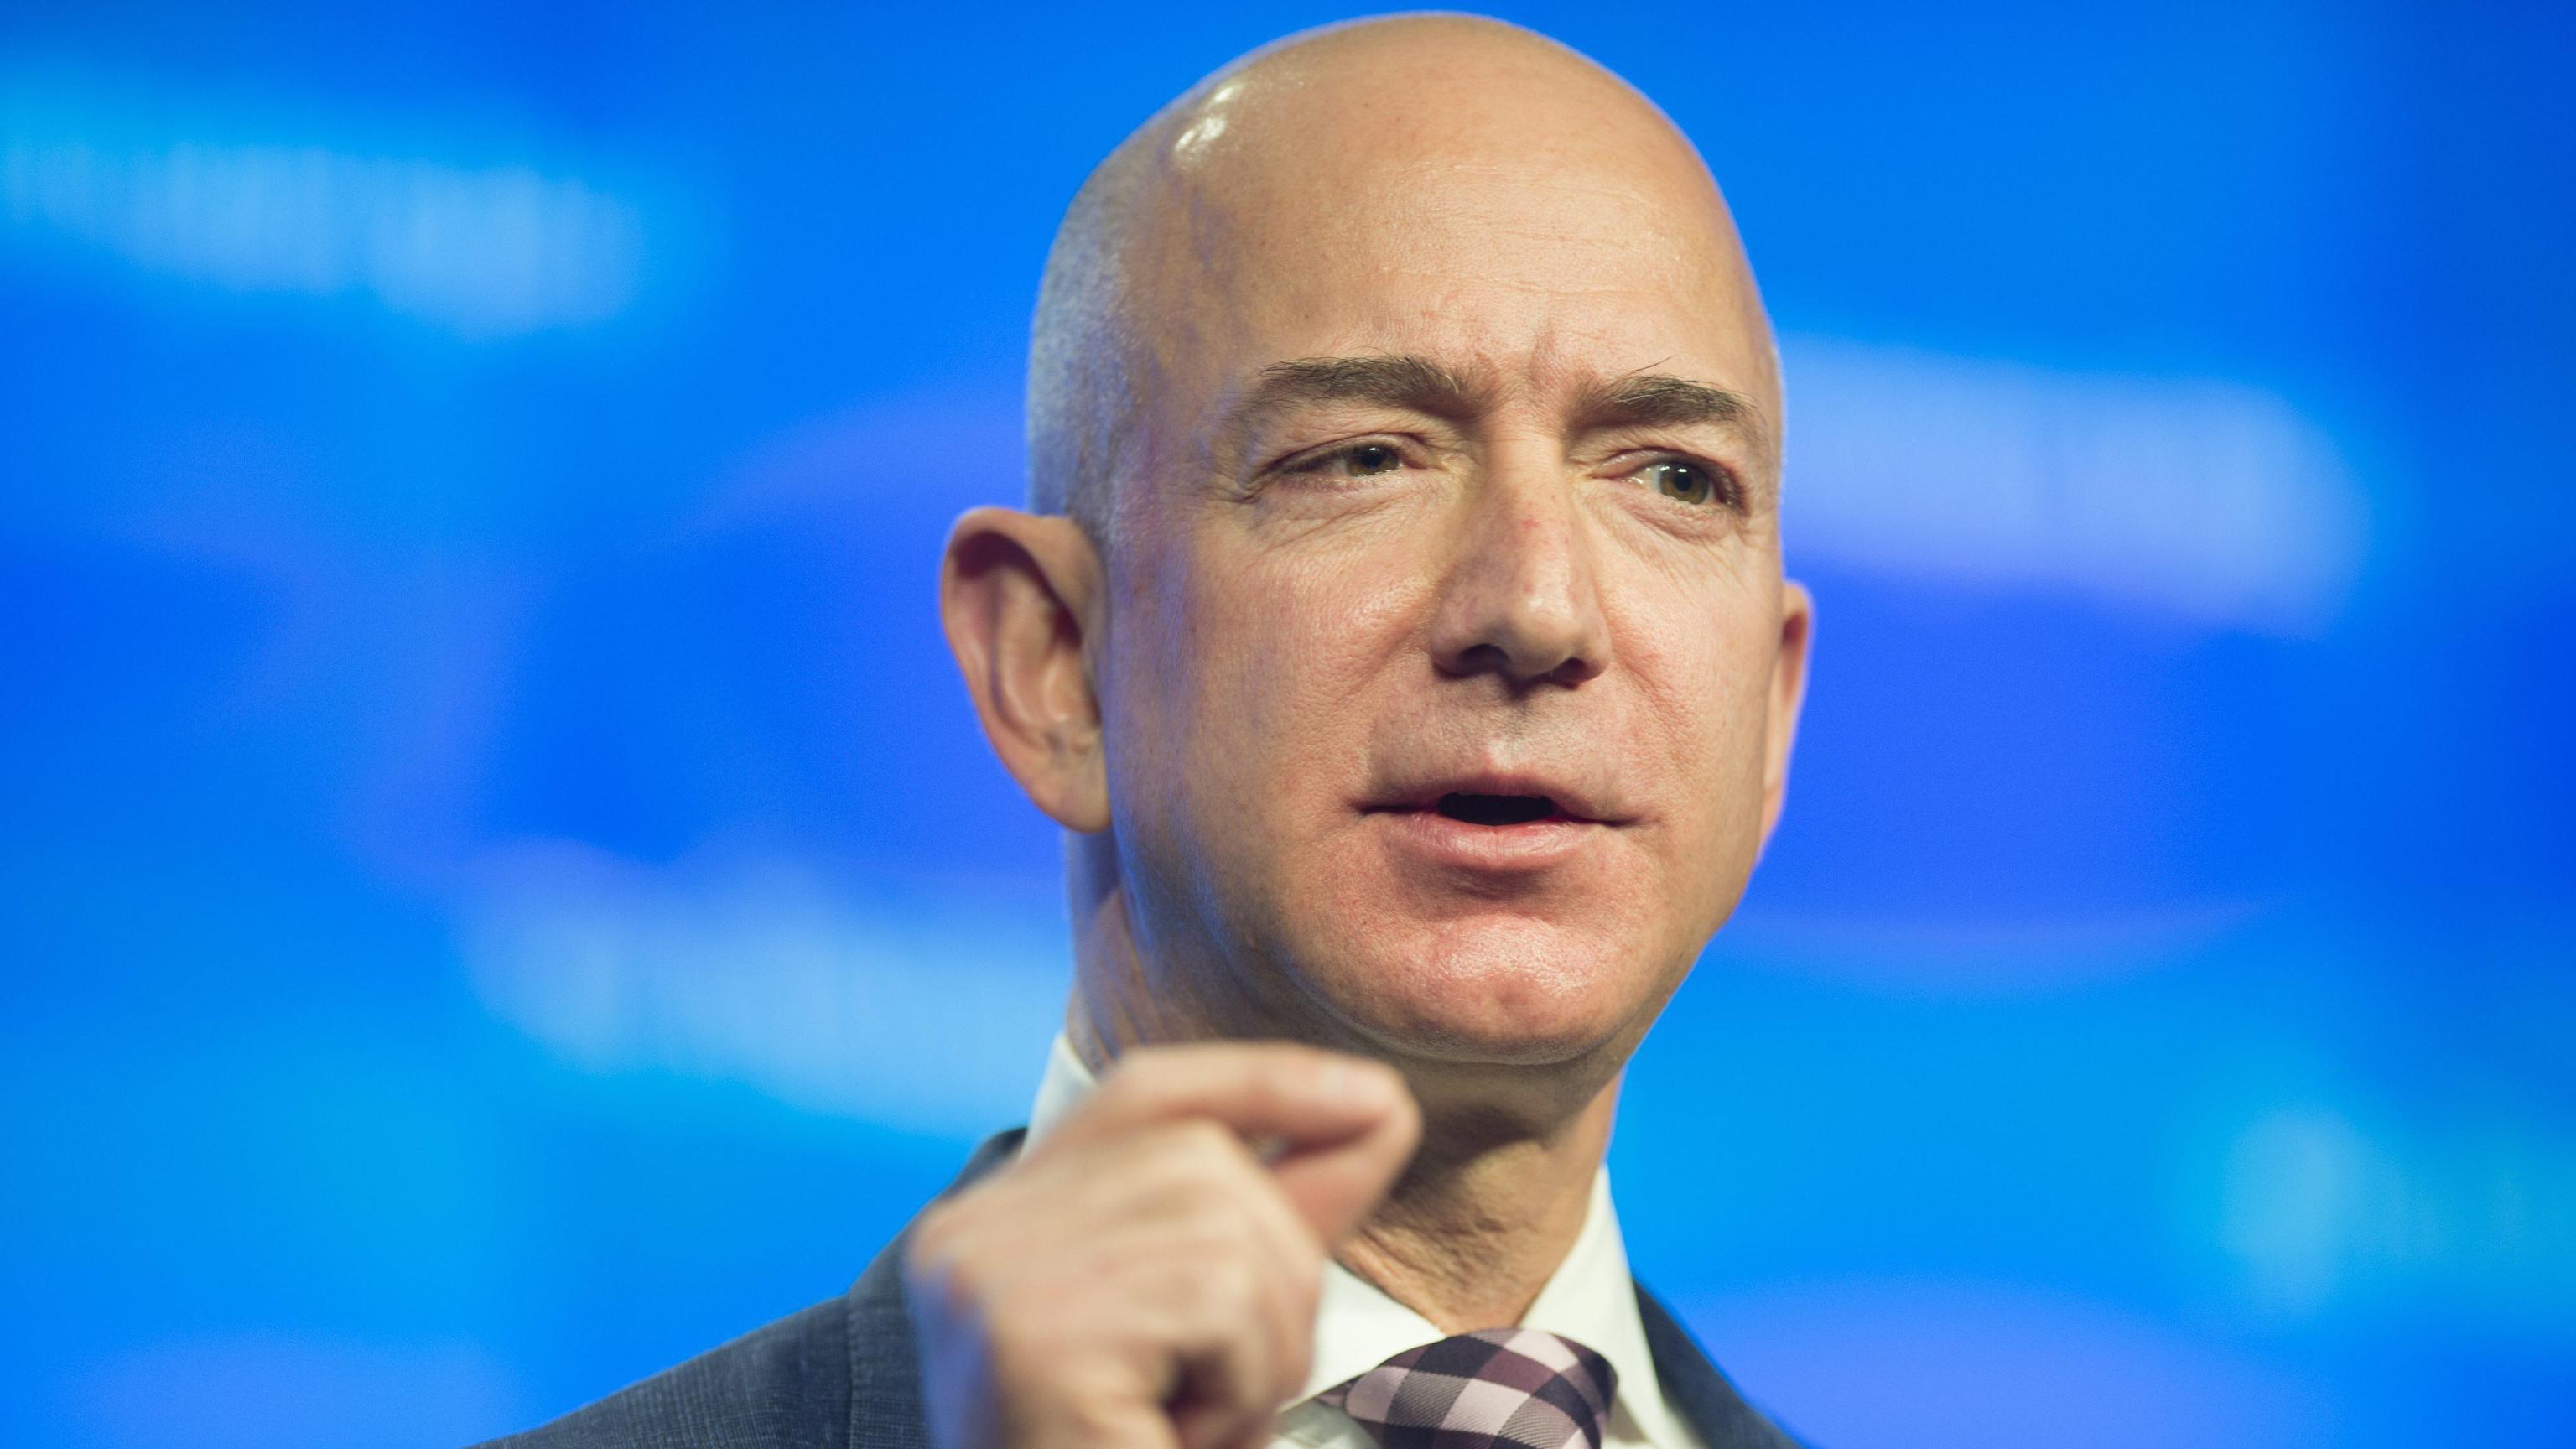 Usa: Bezos dona 33 mln a fondo dreamer